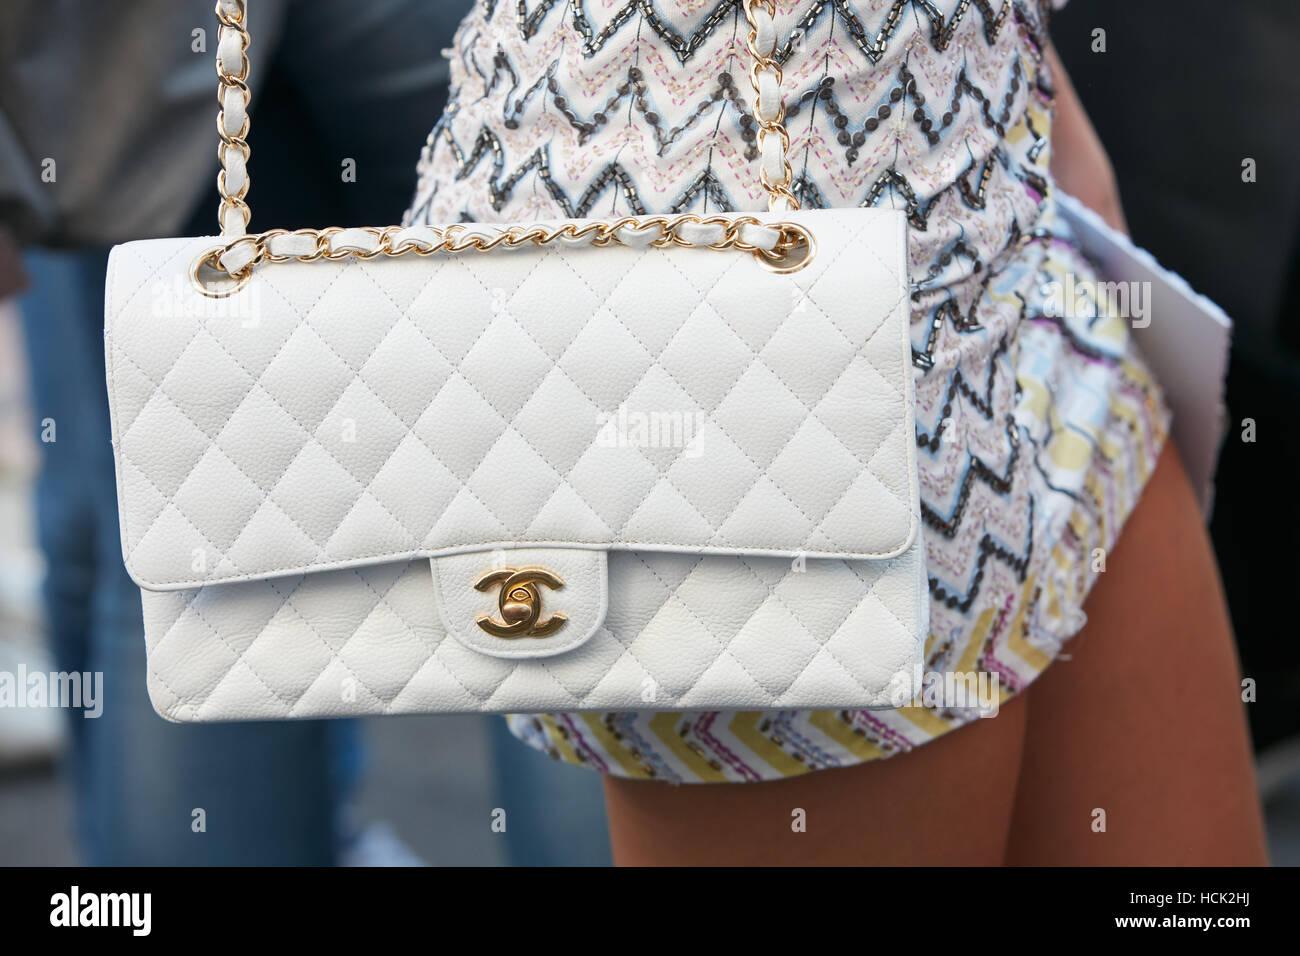 Chanel Look Stockfotos & Chanel Look Bilder - Alamy